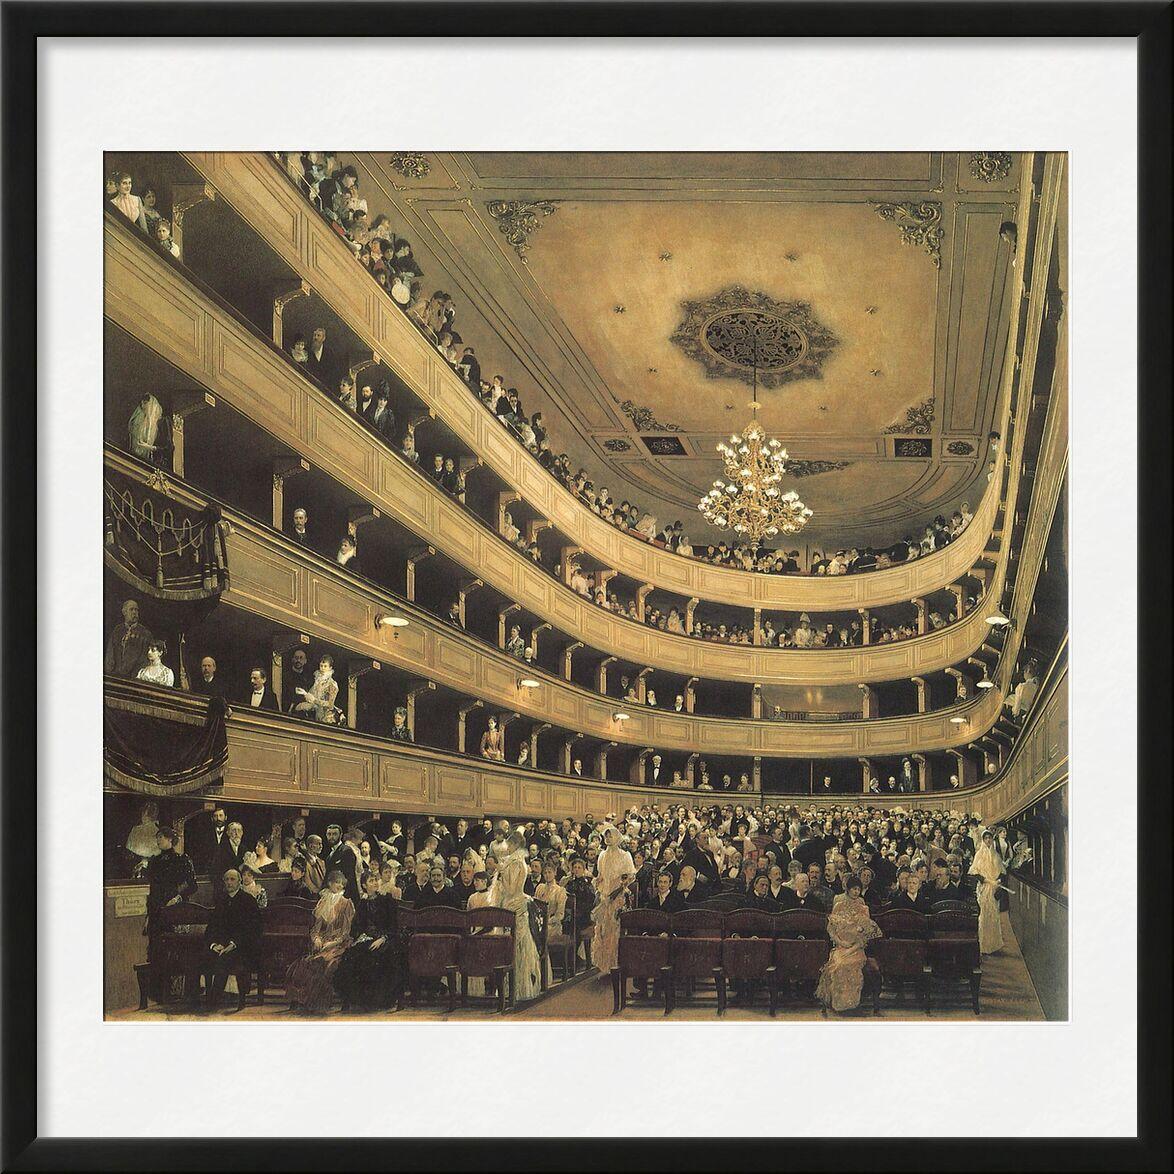 The Auditorium of the Old Castle Theatre, 1888 - Gustav Klimt von AUX BEAUX-ARTS, Prodi Art, KLIMT, Chateau, Malerei, Oper, Theater, realistisch